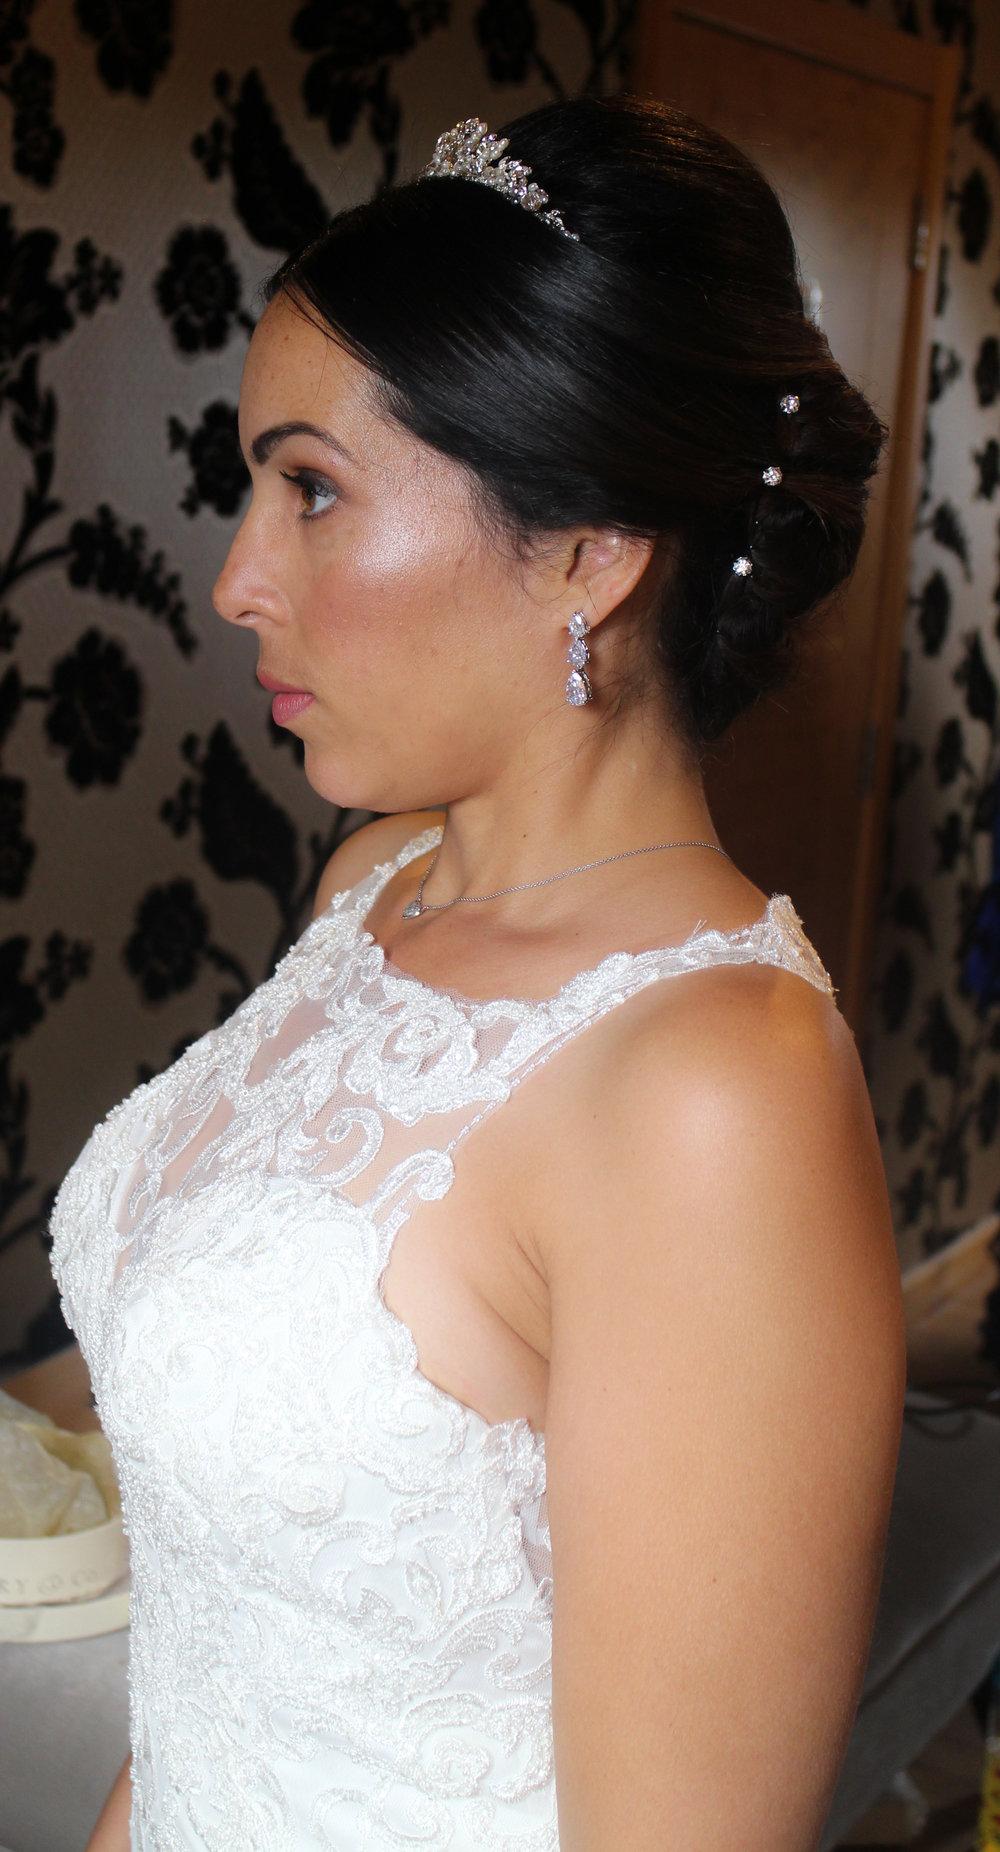 steph bridal makeup .jpg